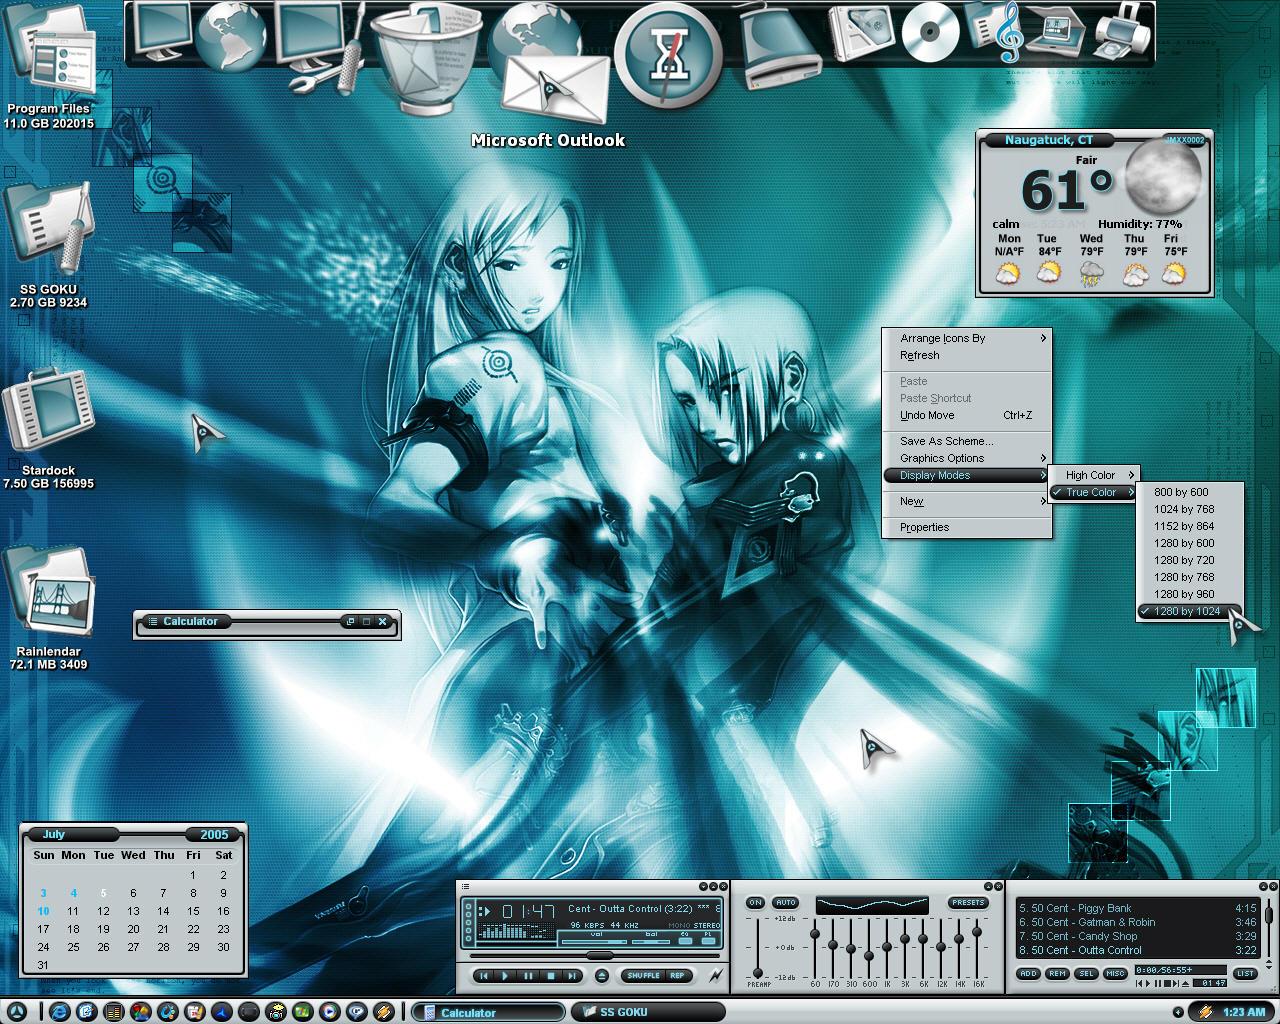 MixUpBlend by ssgoku-23